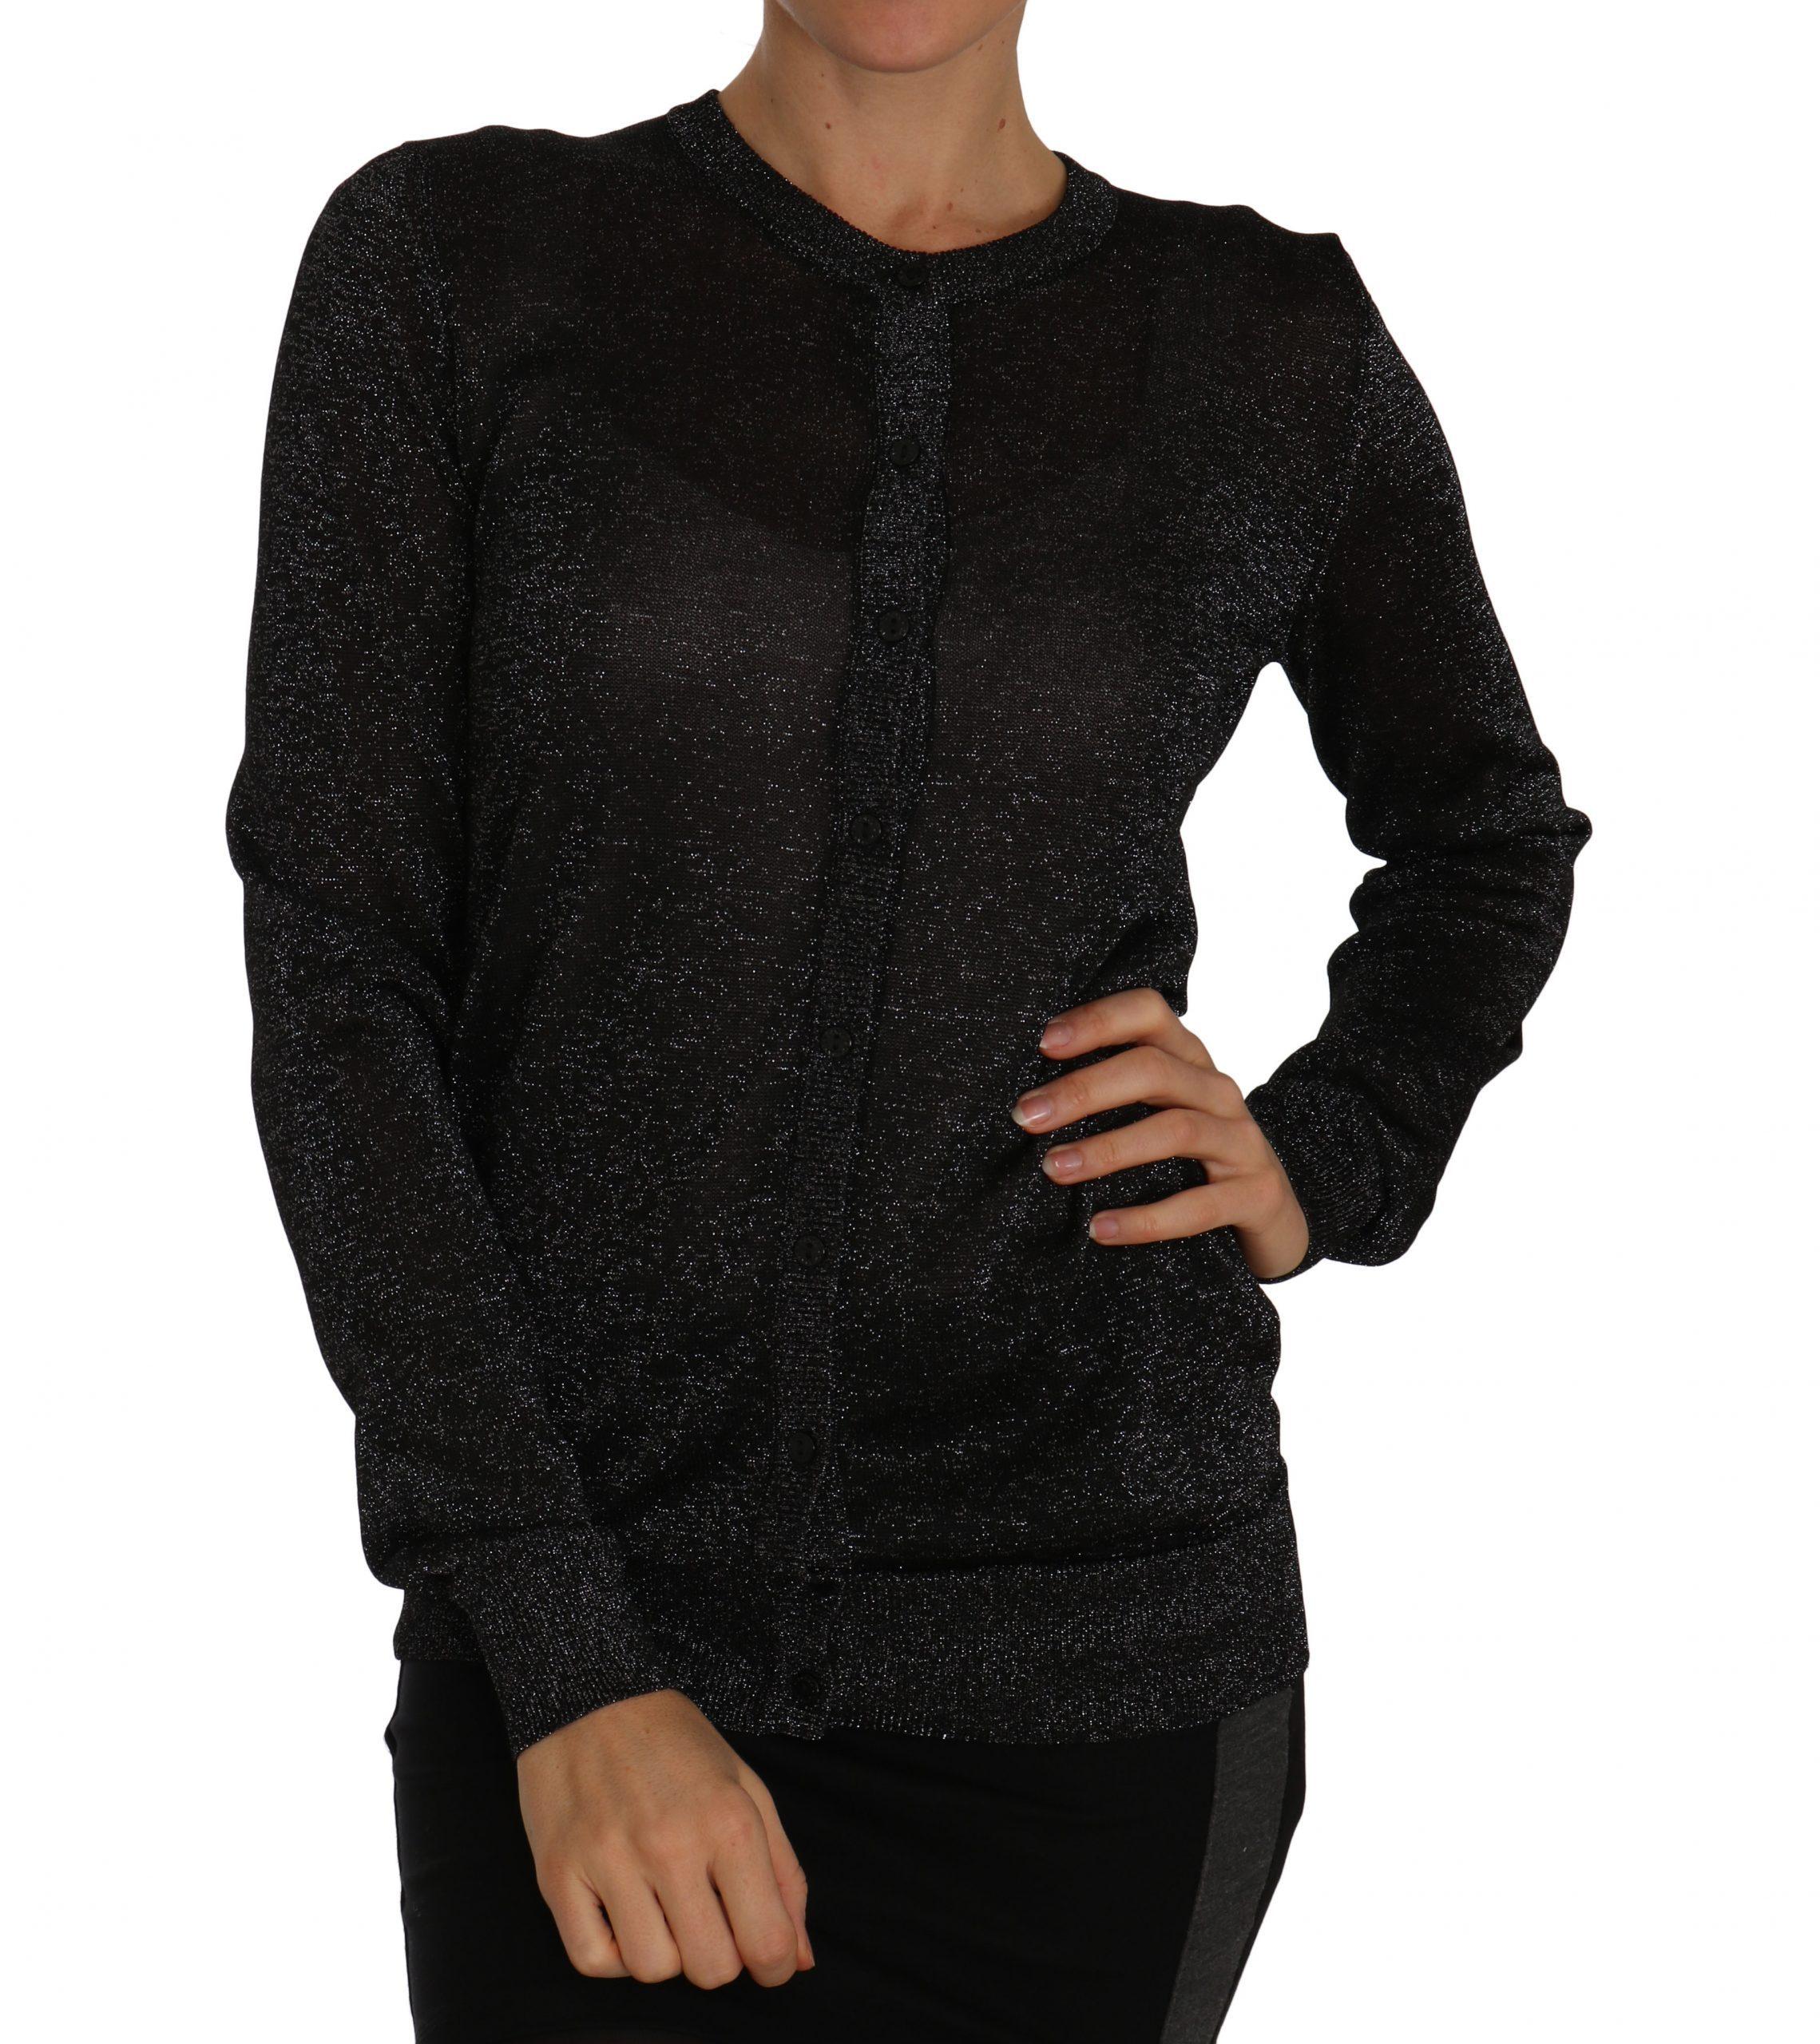 Dolce & Gabbana Women's Lightweight Cardigan Black TSH2264 - IT40|S